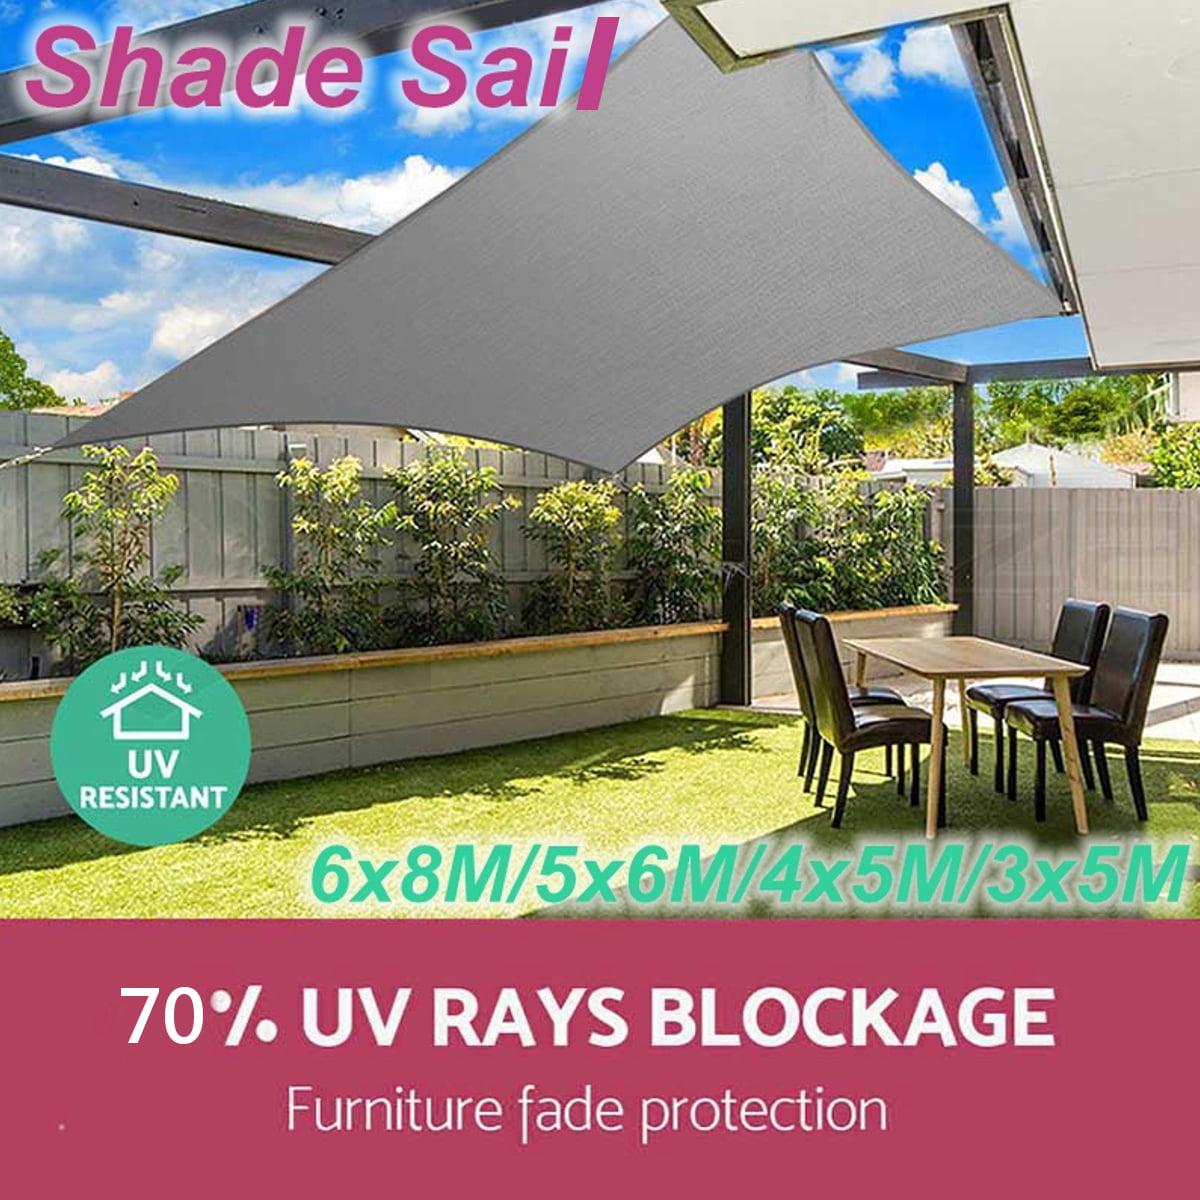 Sun Shade Sail Garden Patio Oxford Cloth Sunscreen Awning Canopy Screen Outdoor 70% UV Block